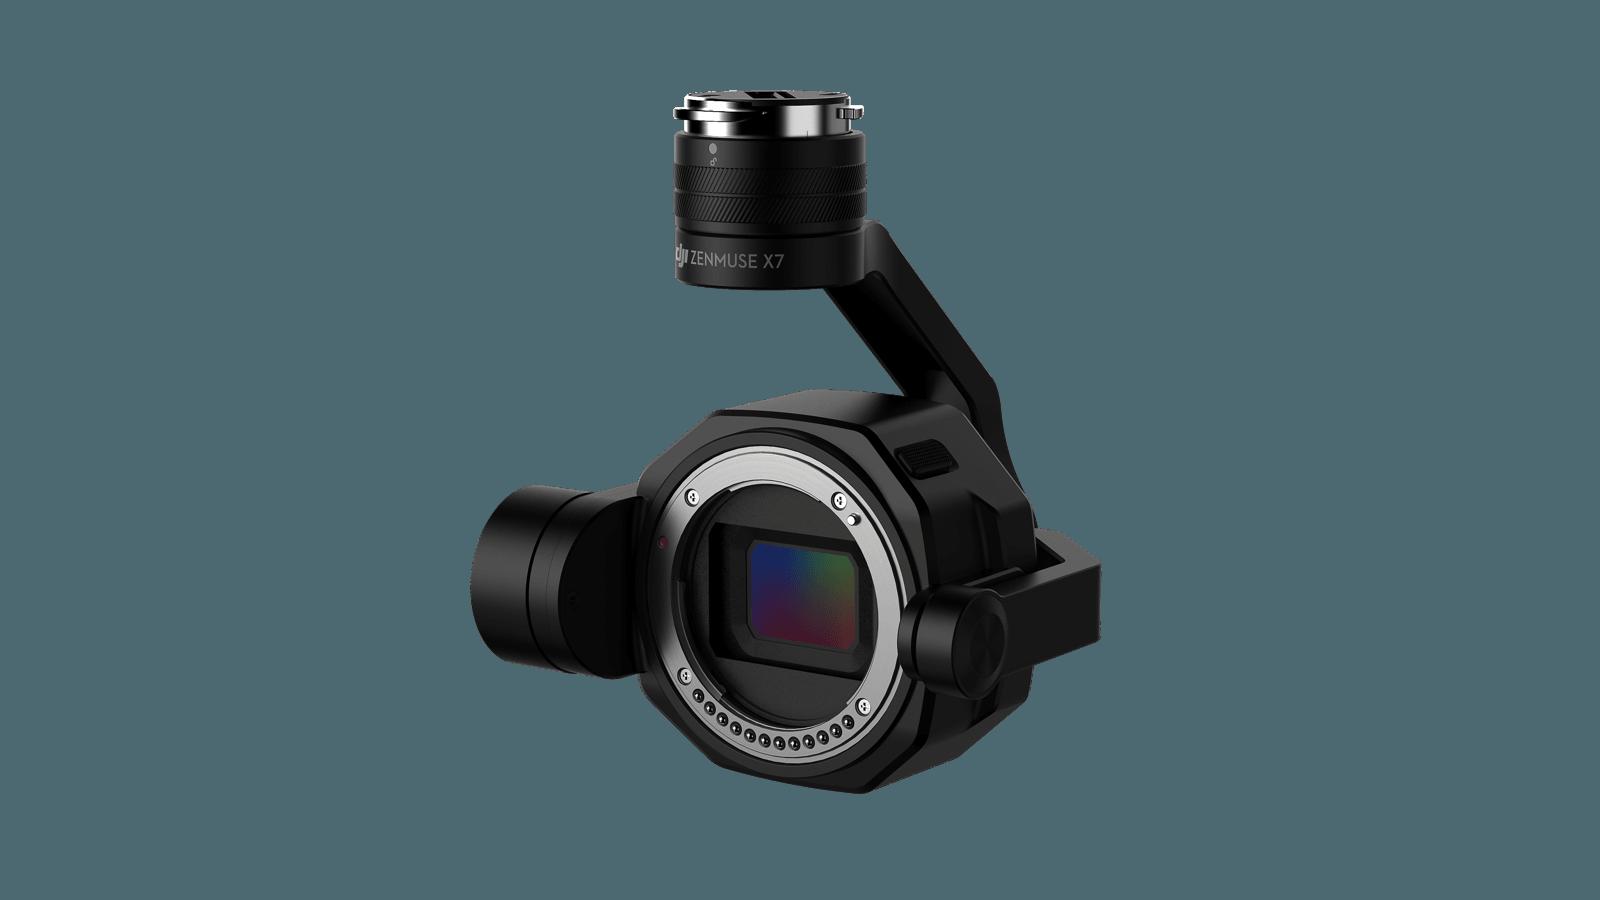 DJI X7 Super 35mm sensor